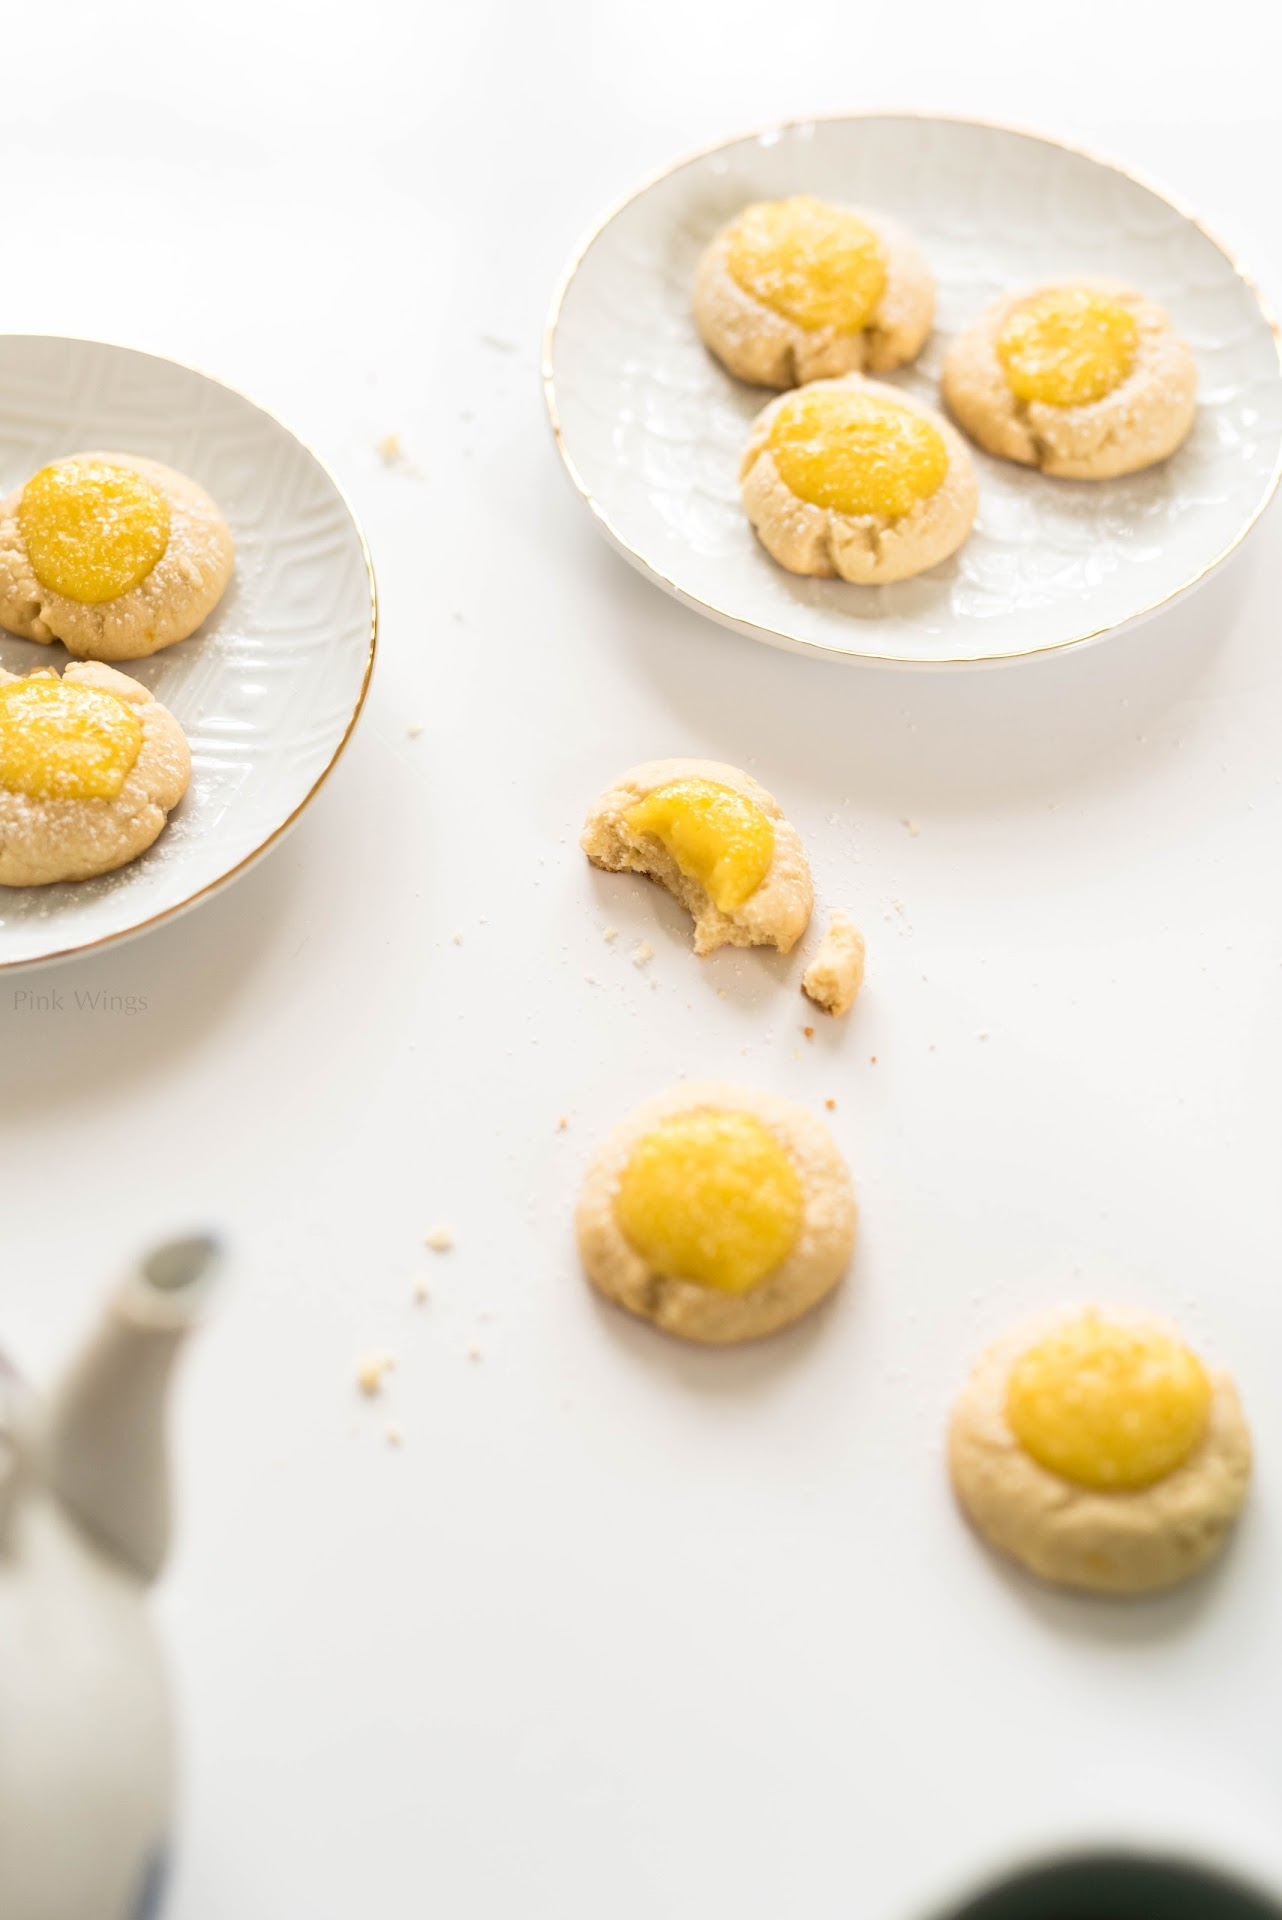 unique cookies, grapefruit dessert, grapefruit juice recipe, grapefruit curd, cookie exchange